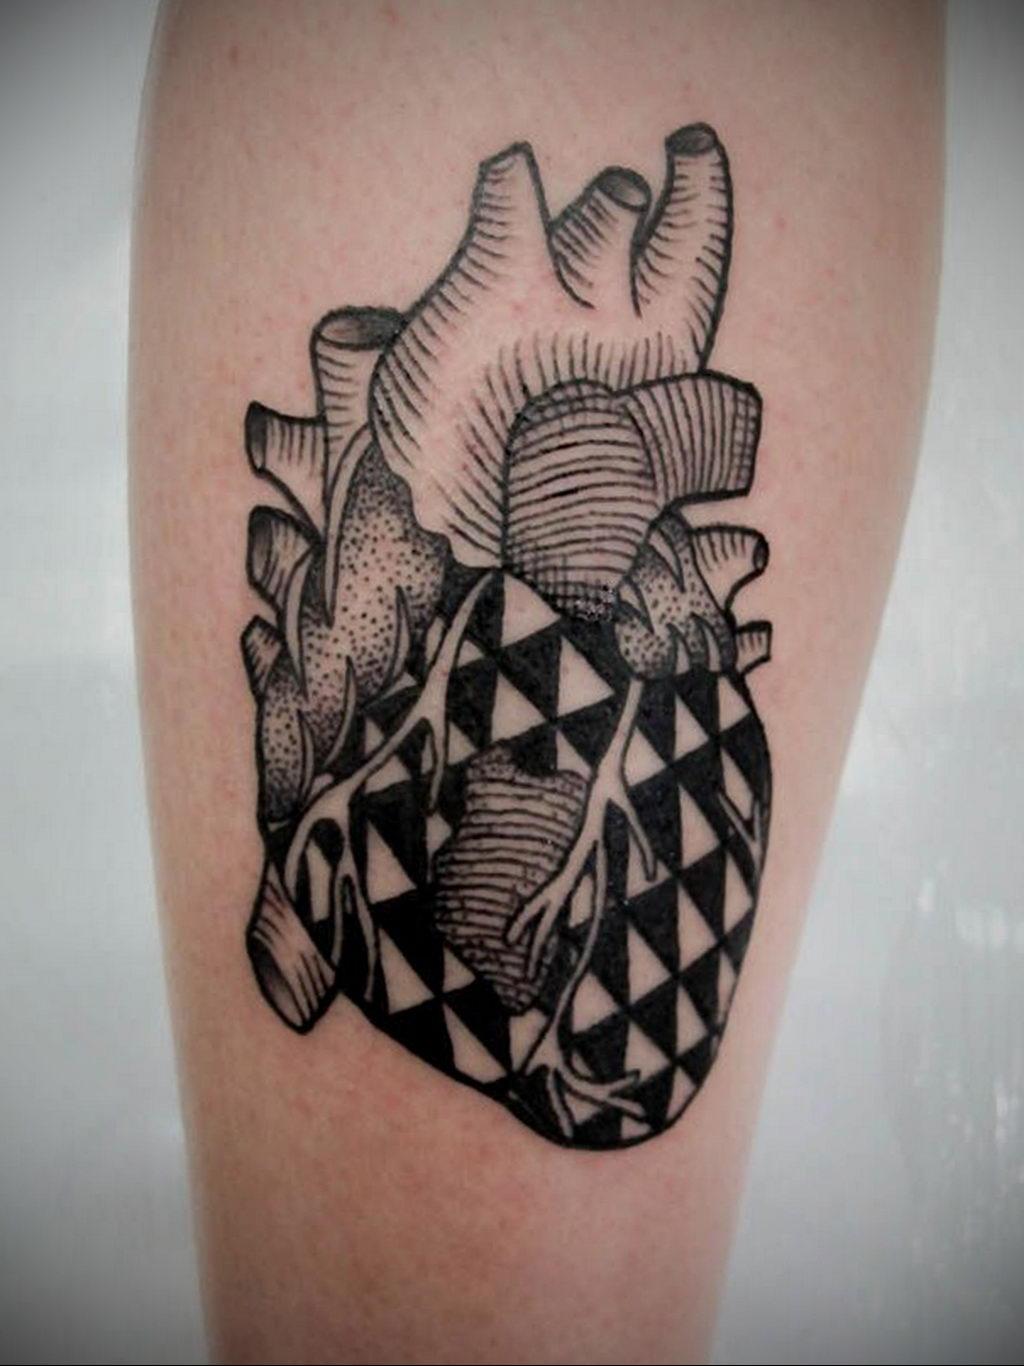 Фото тату про любовь рисунок Сердце 03.02.2020 №014 -heart tattoo- tatufoto.com